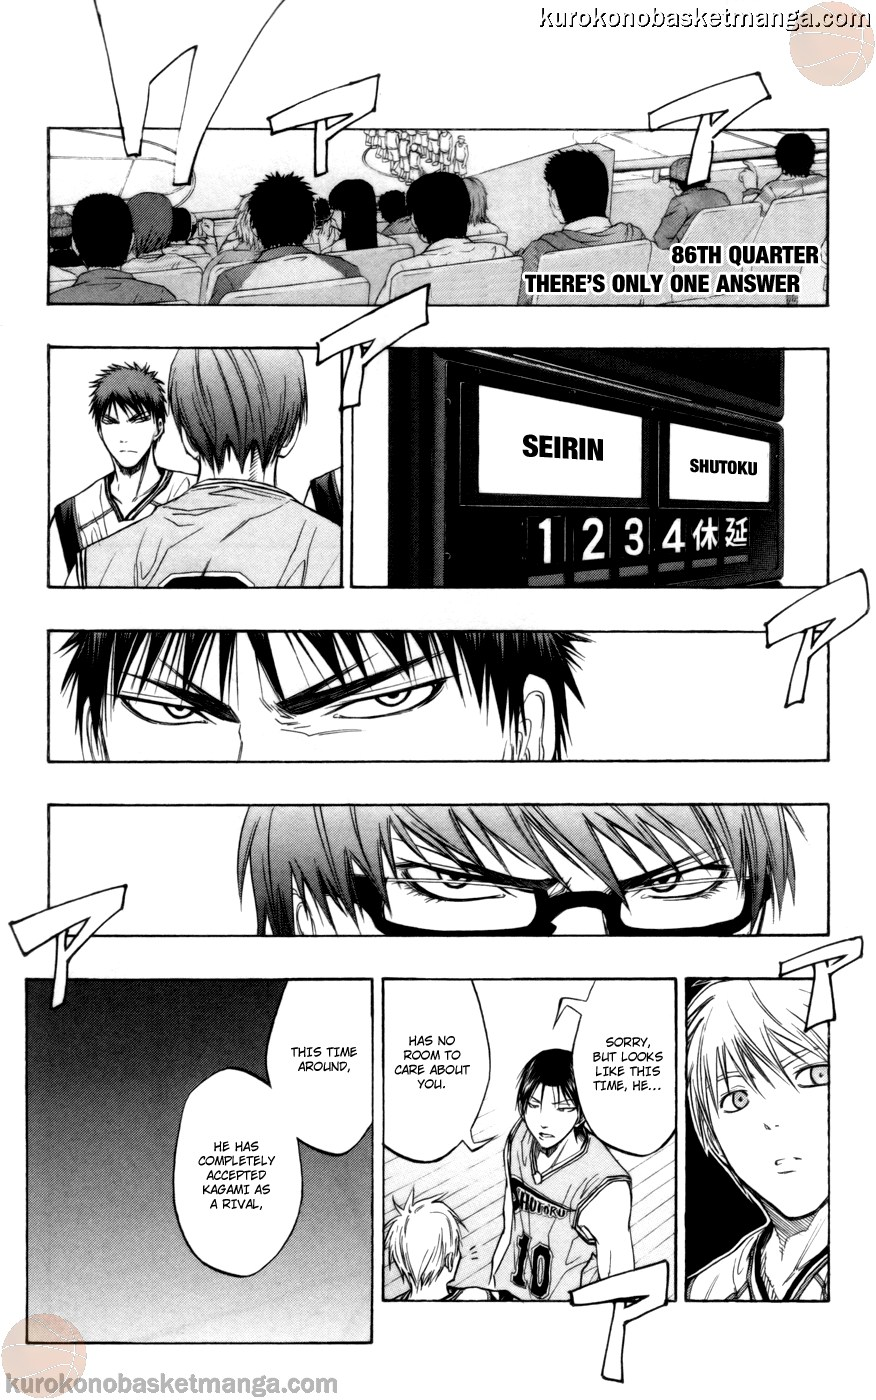 Kuroko no Basket Manga Chapter 86 - Image 01